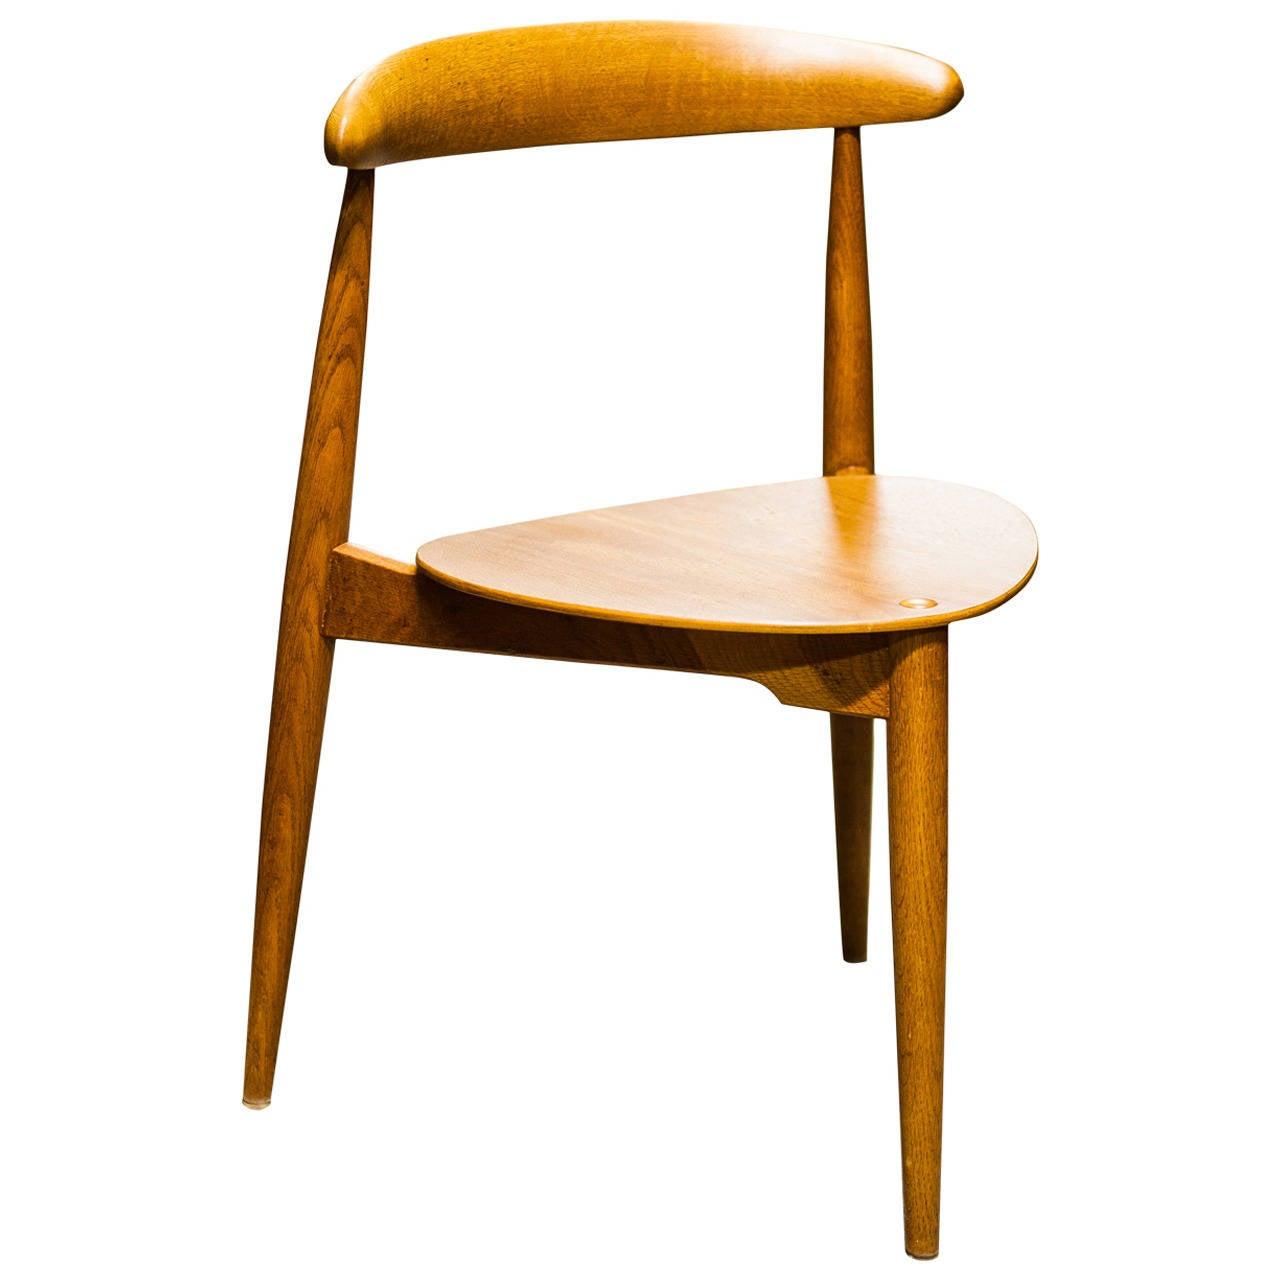 hans j wegner heart chair at 1stdibs. Black Bedroom Furniture Sets. Home Design Ideas